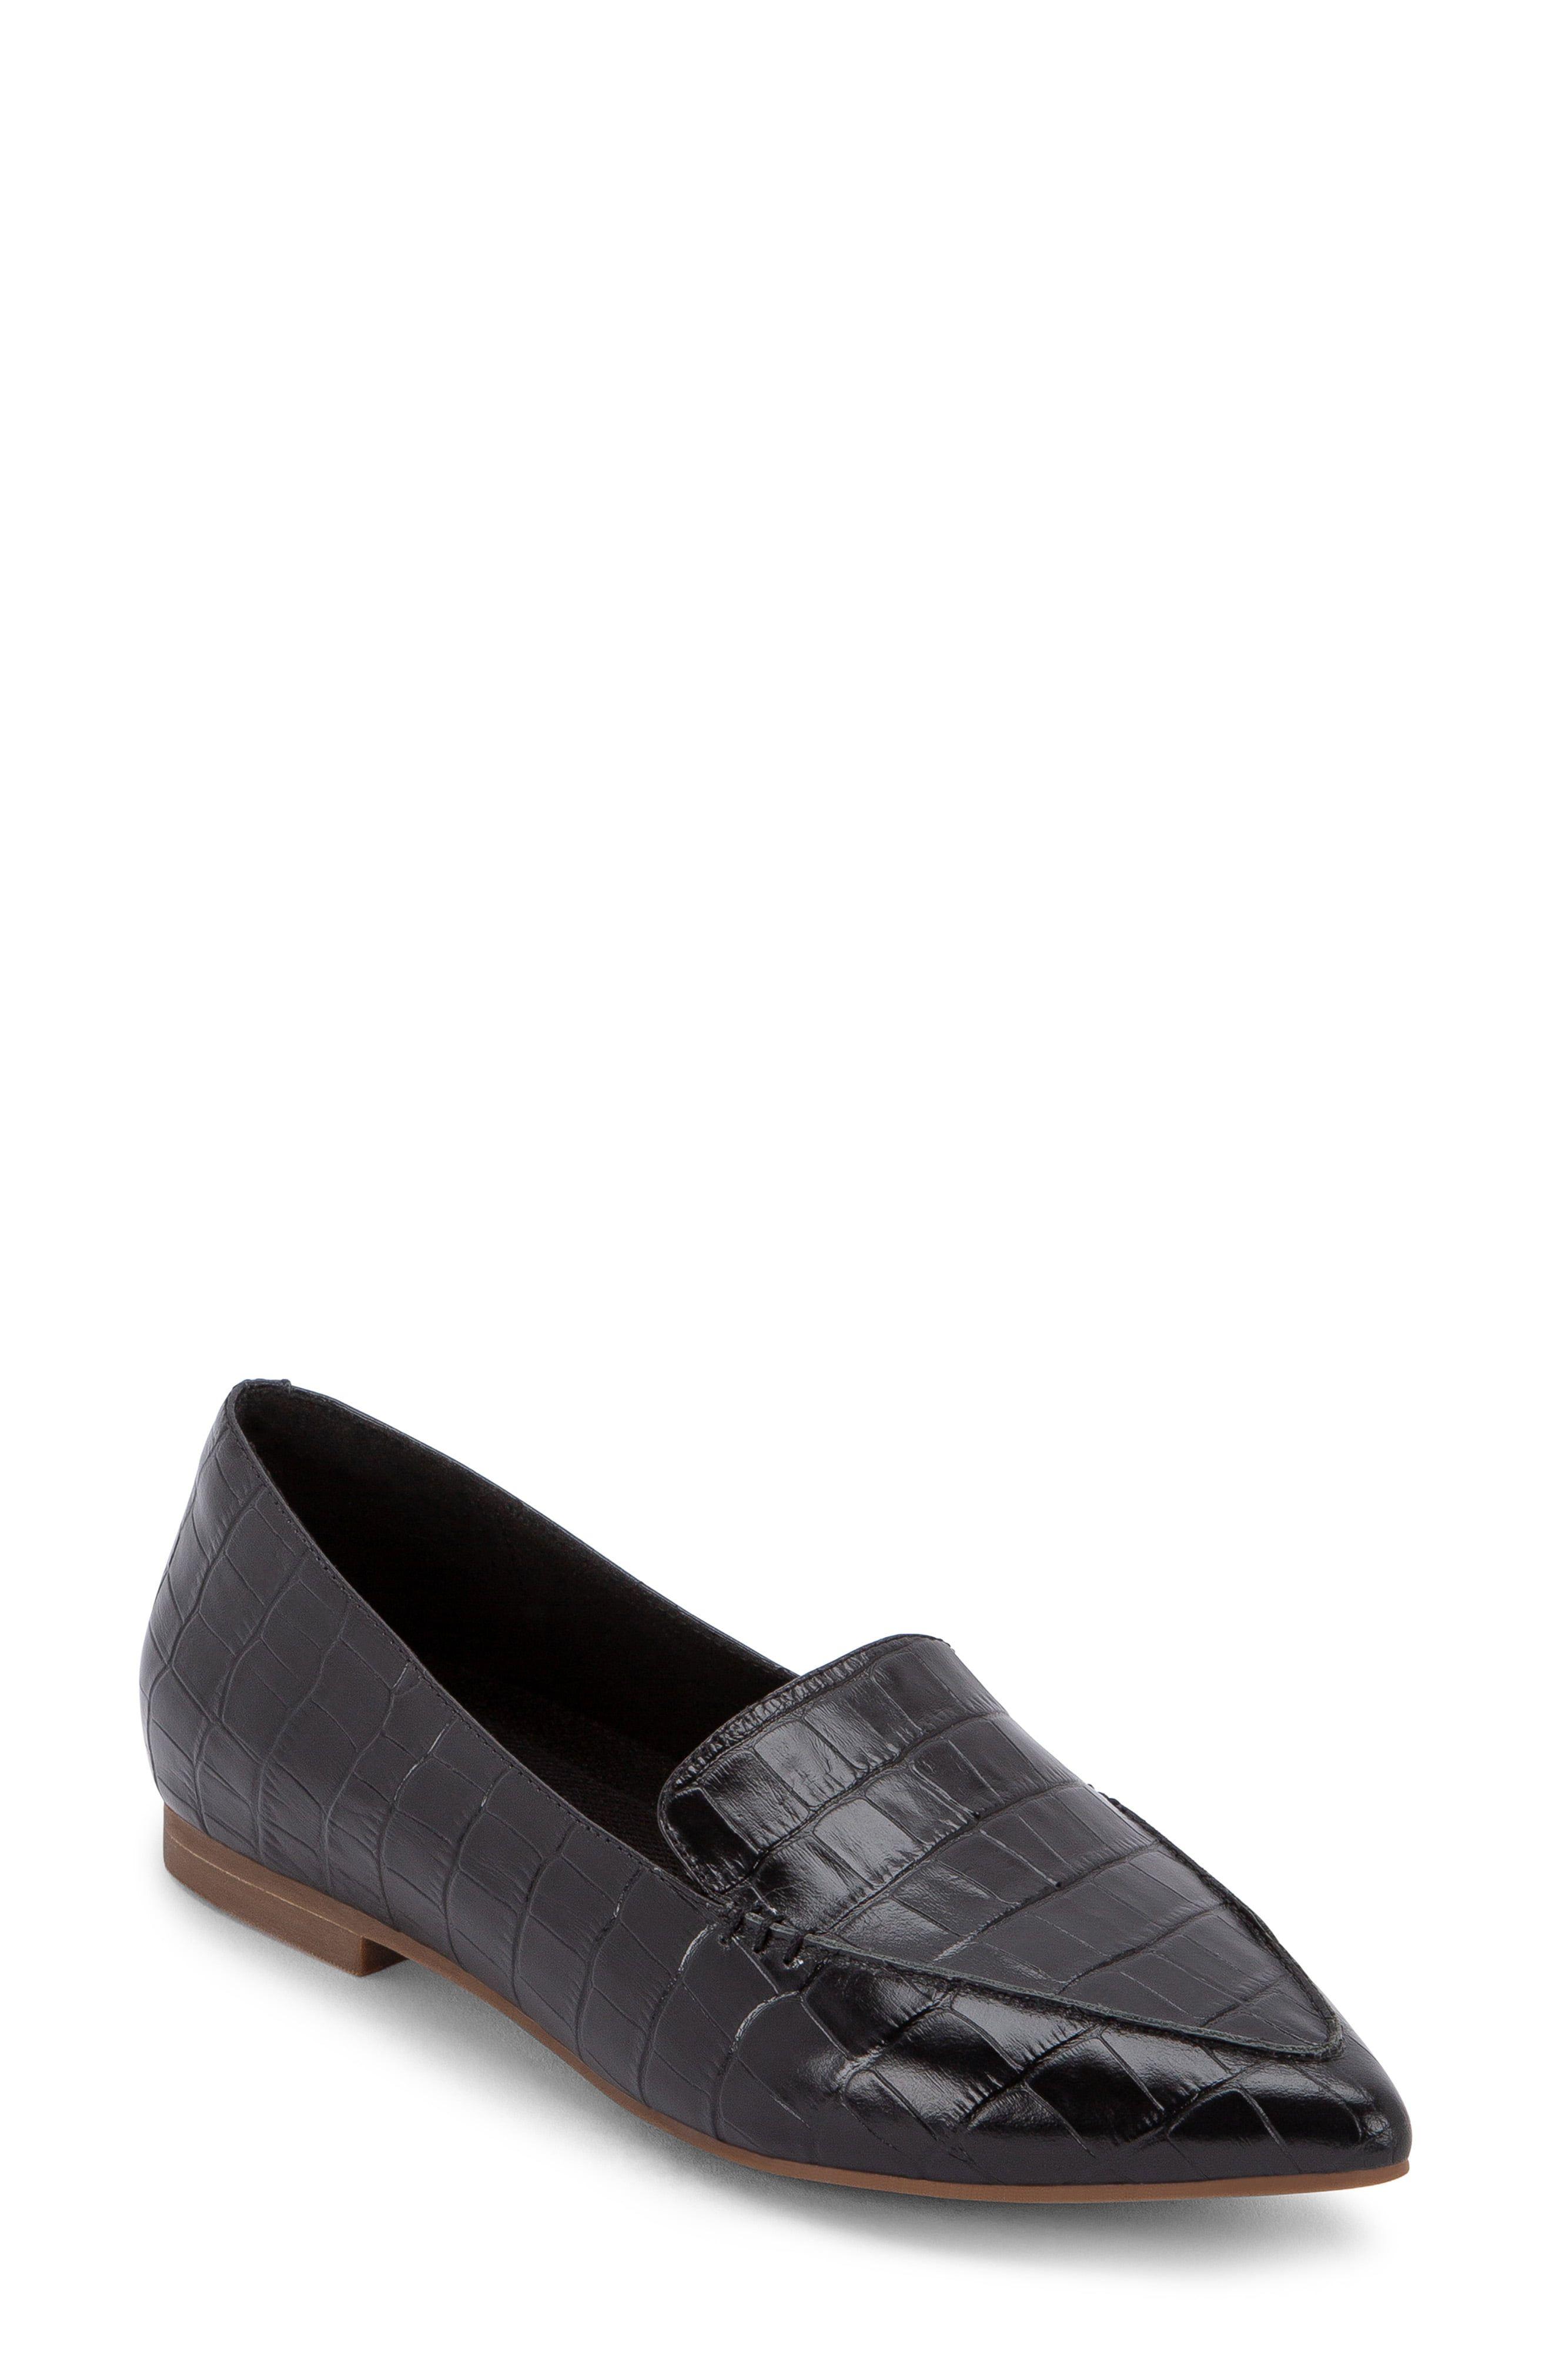 womens white dress shoes size 11